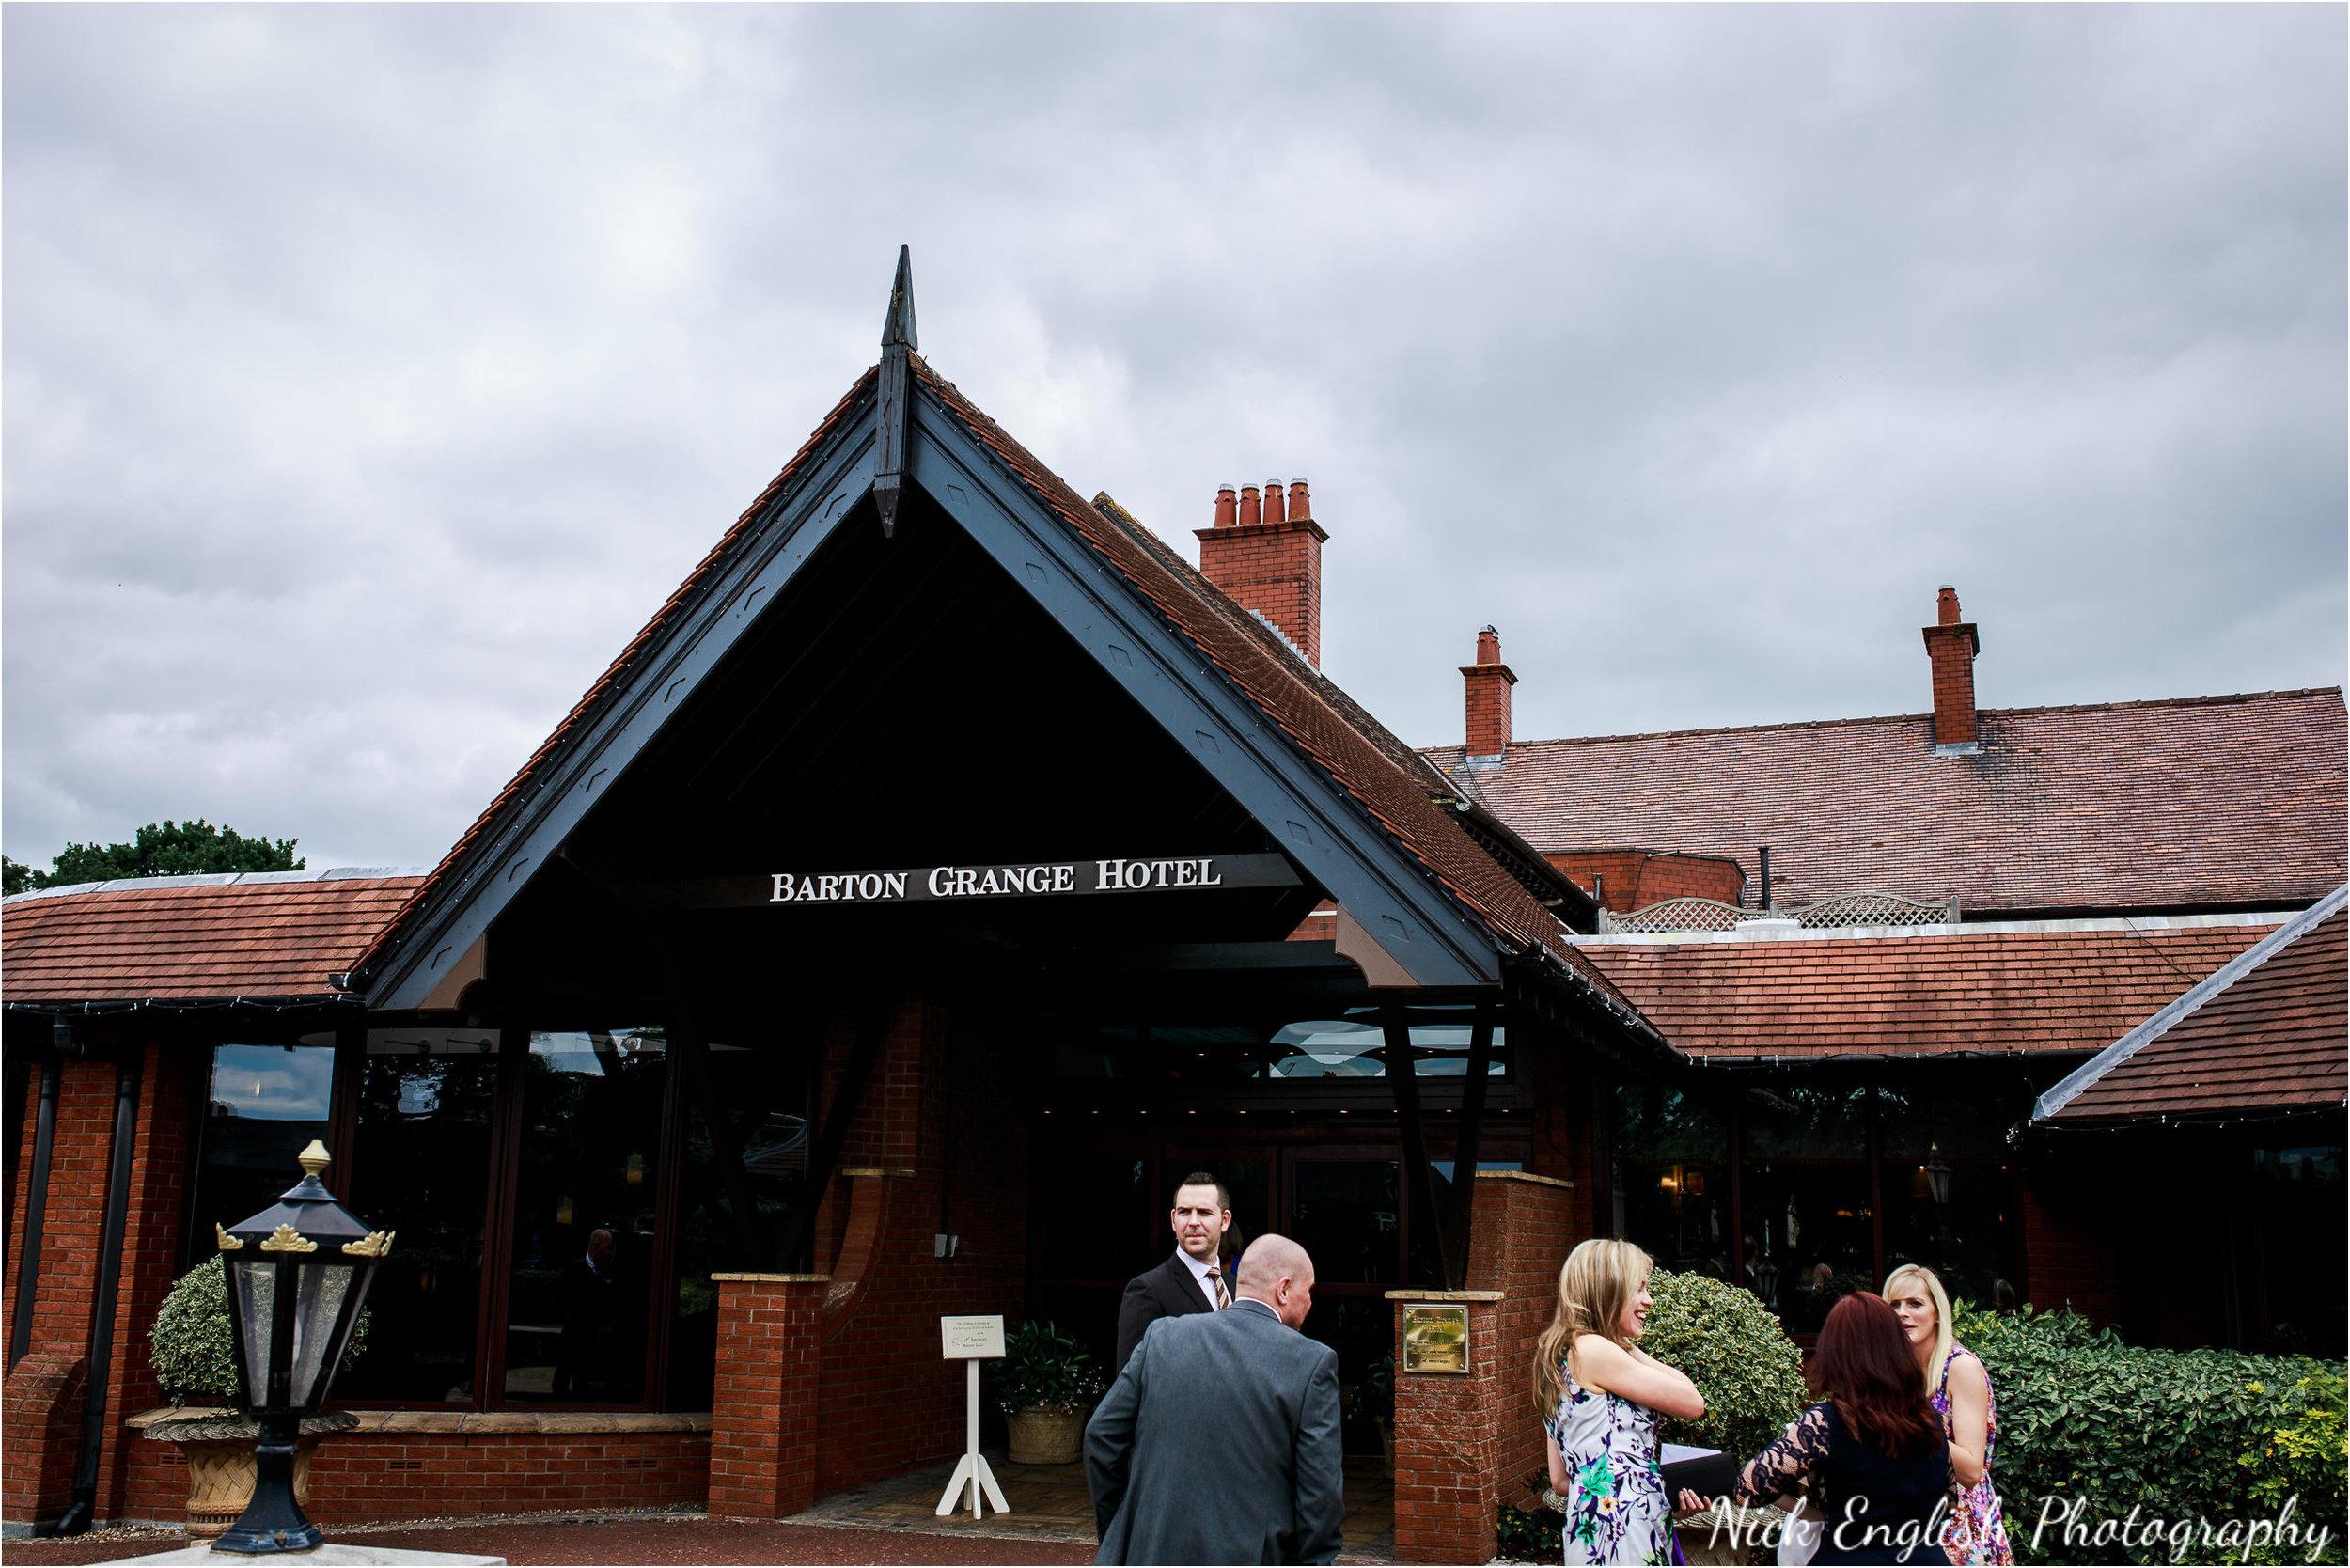 Emily David Wedding Photographs at Barton Grange Preston by Nick English Photography 43jpg.jpeg